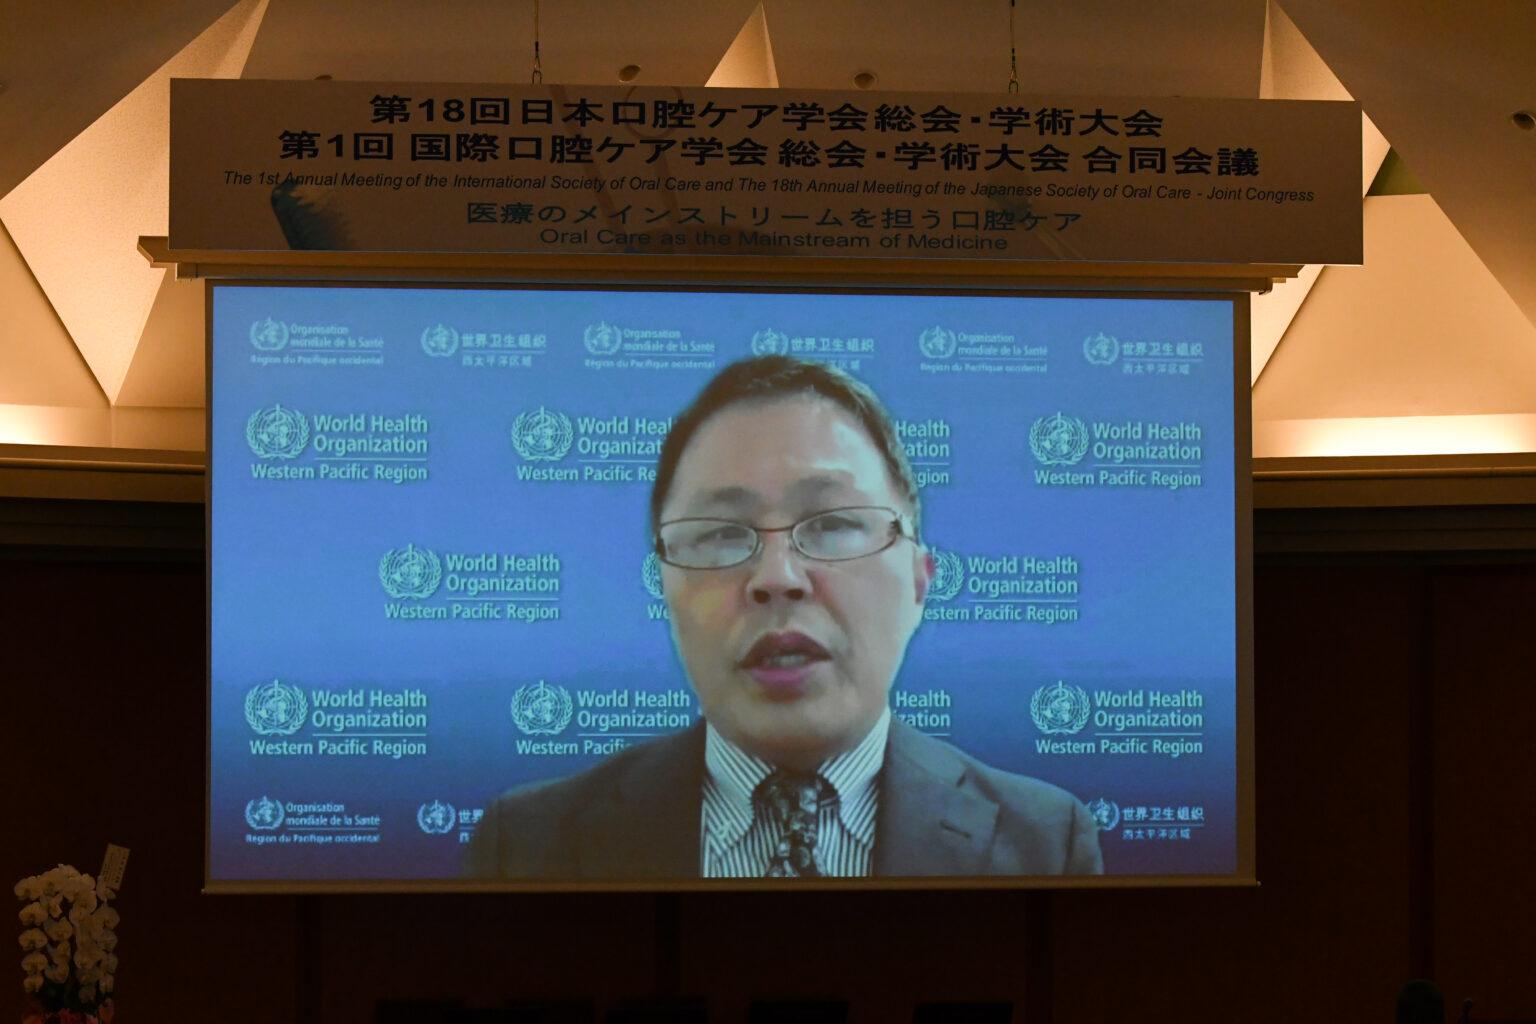 Dr Shinjiro Nozaki, Compliance and Risk Management Officer, World Health Organization